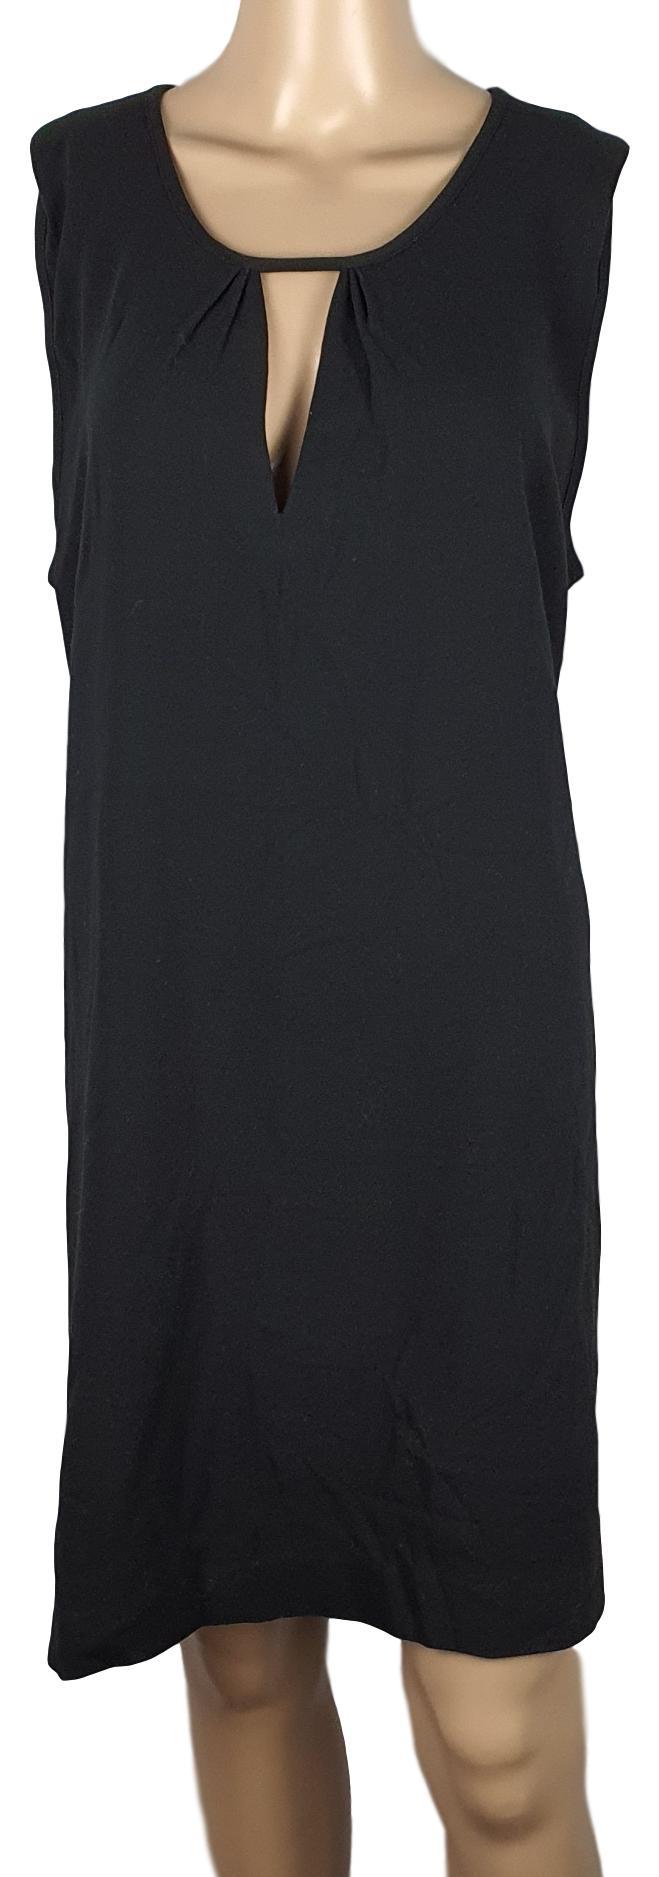 Robe -Monoprix - taille 48